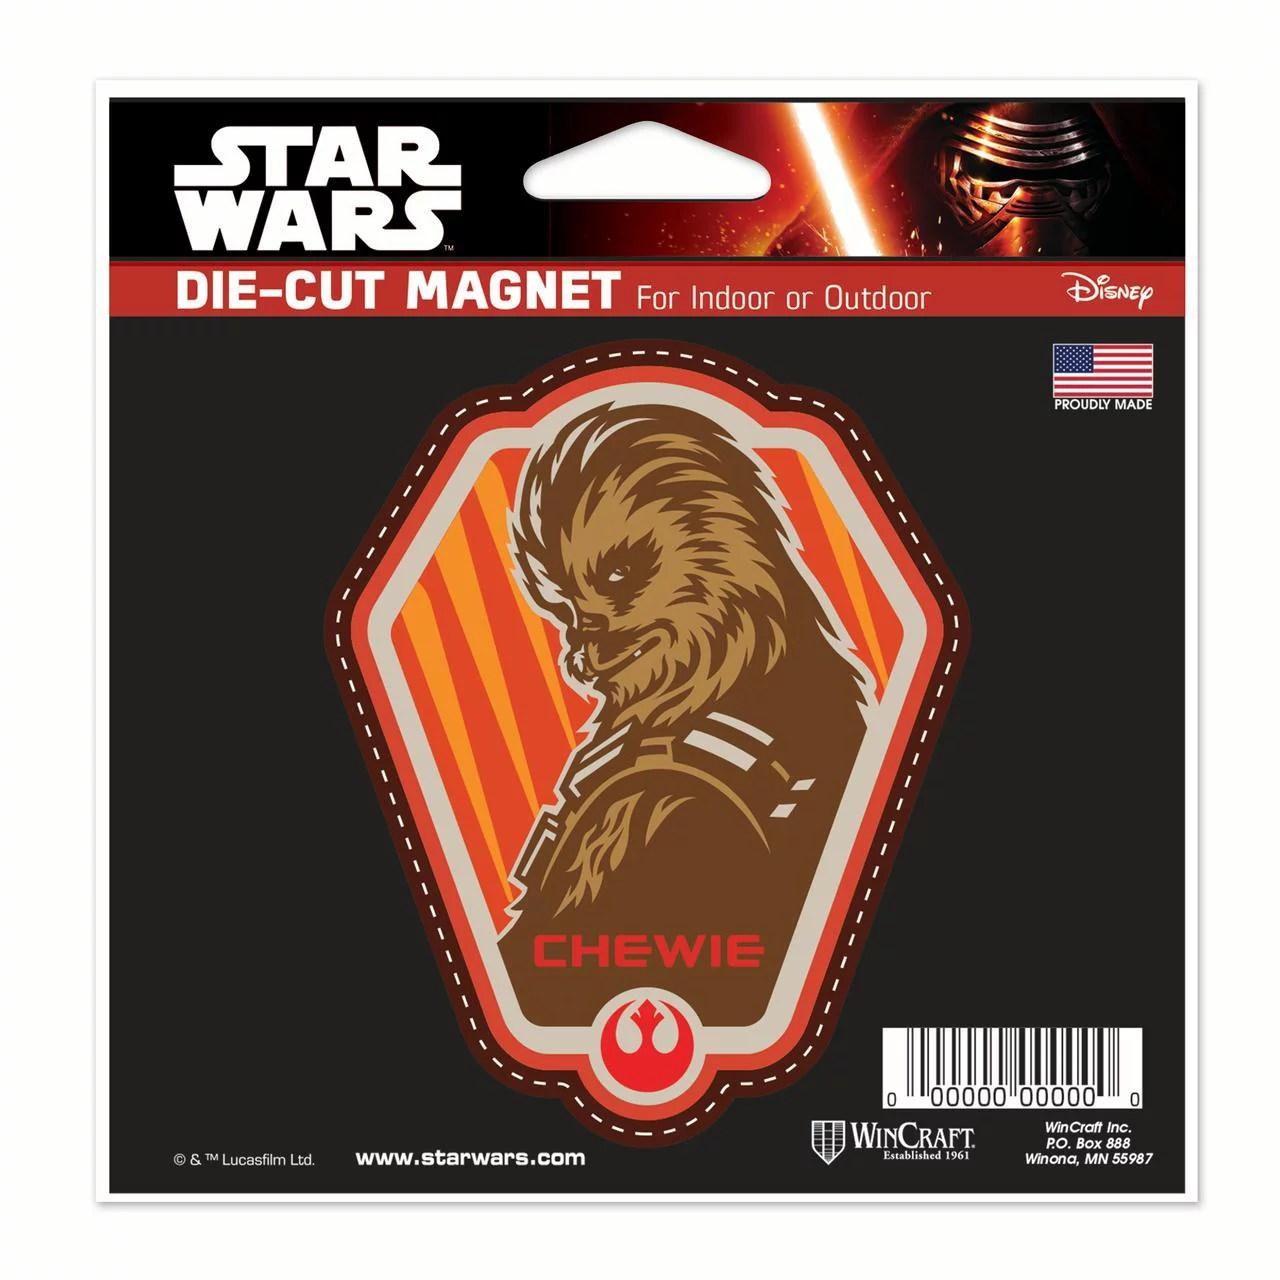 Star Wars Chewie Car Refrigerator Magnet 5x5 By Wincraft